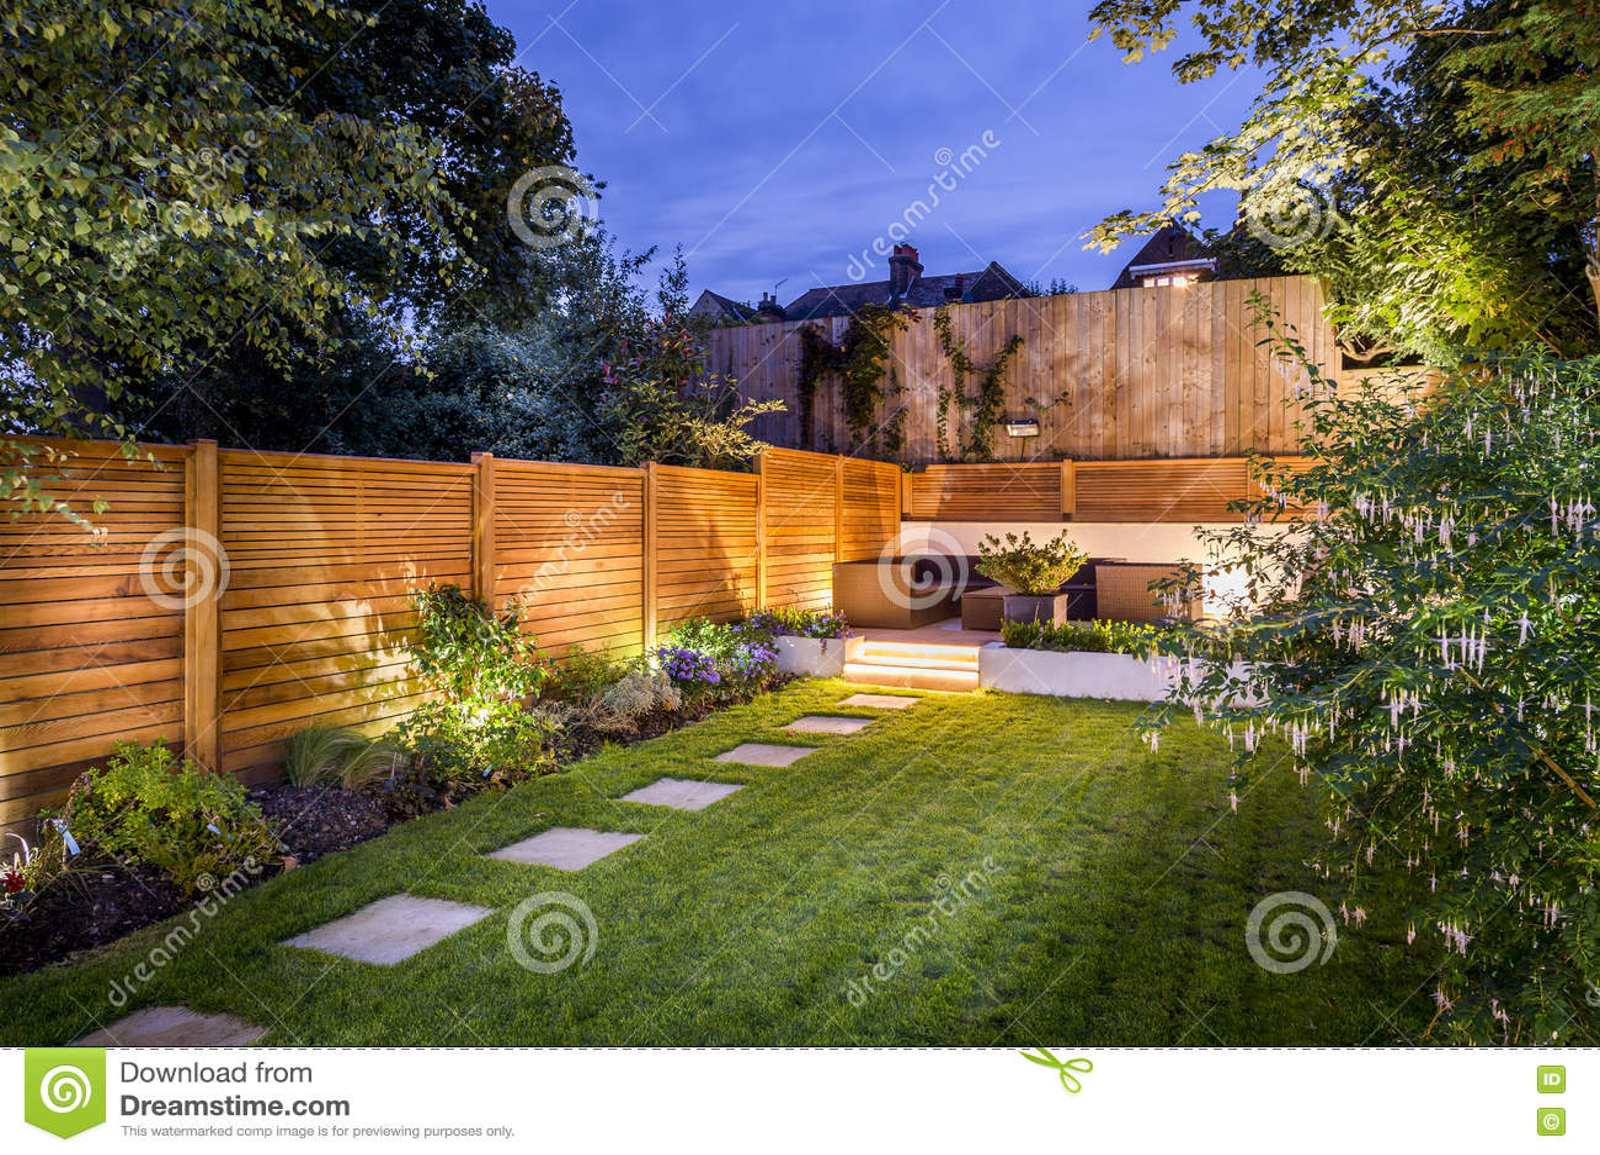 Outdoor backyard patio